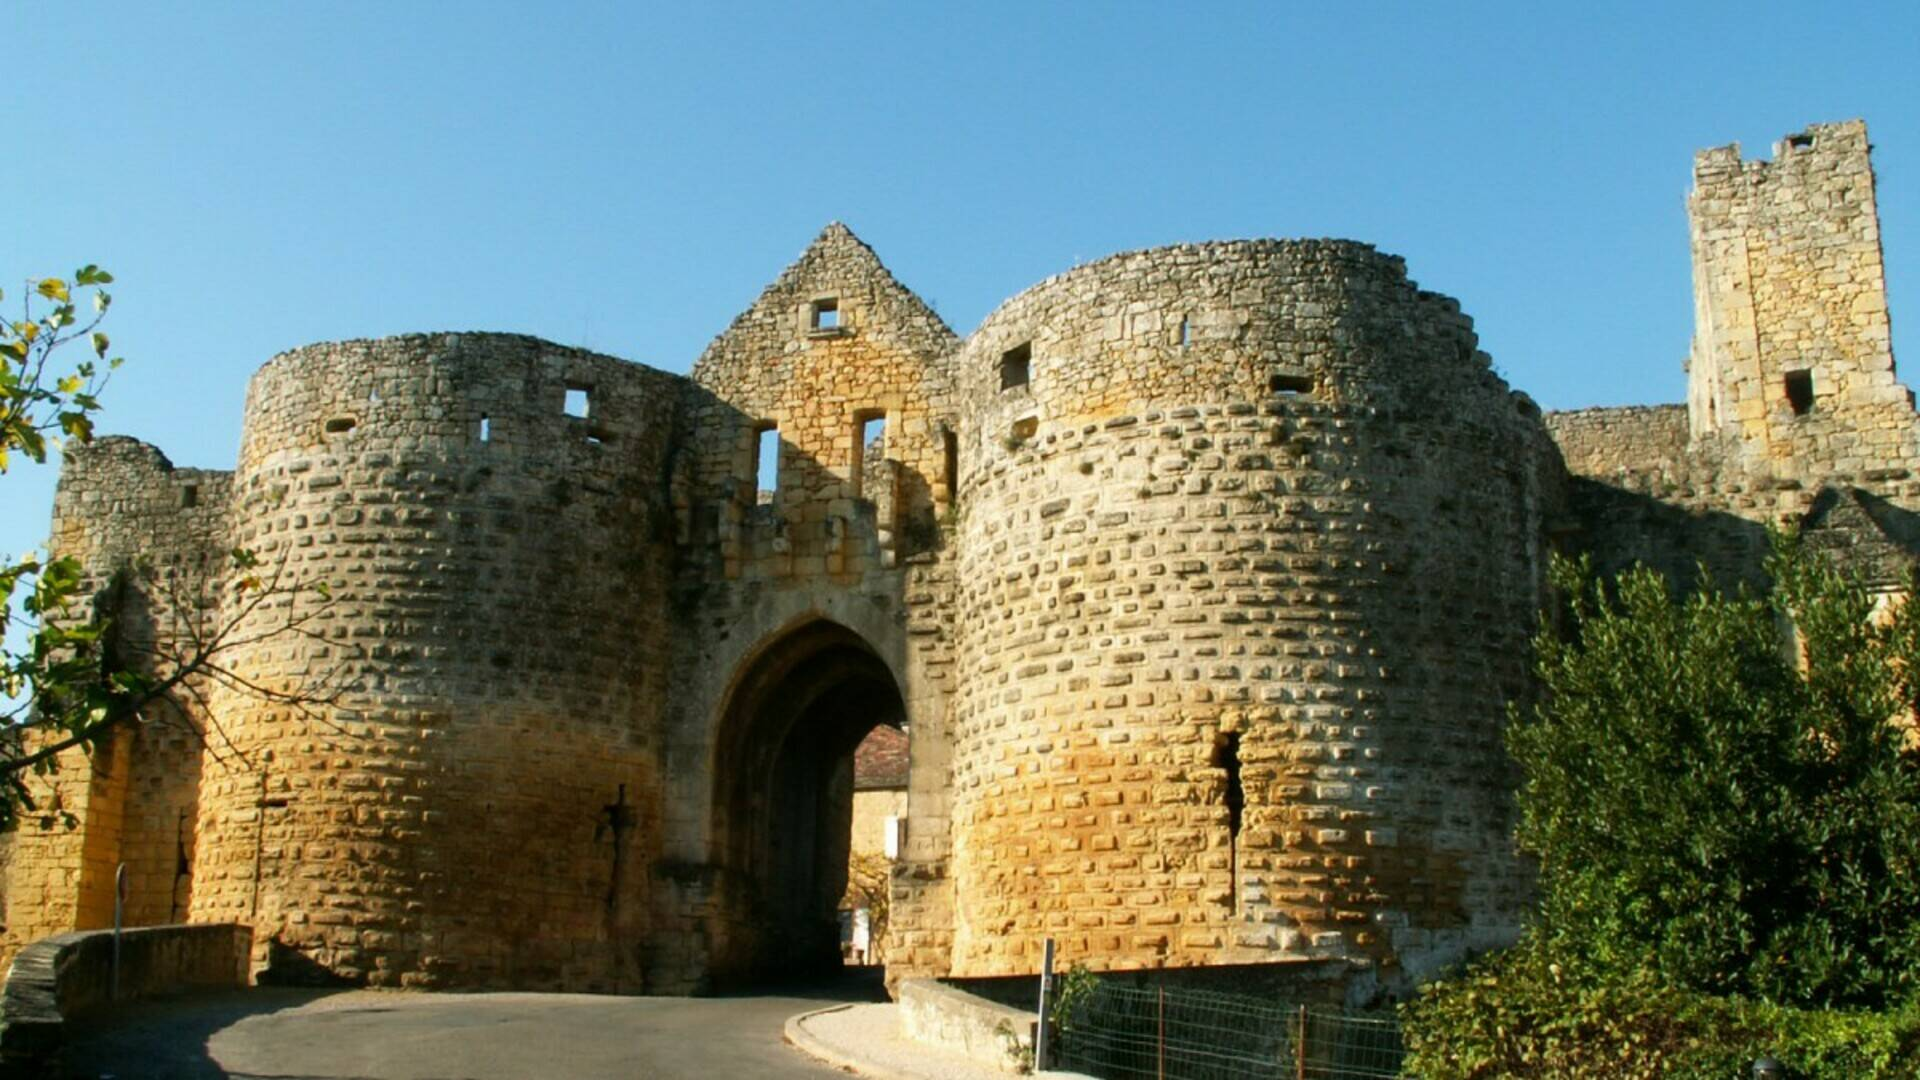 © Office de Tourisme Périgord Noir Sud Dordogne